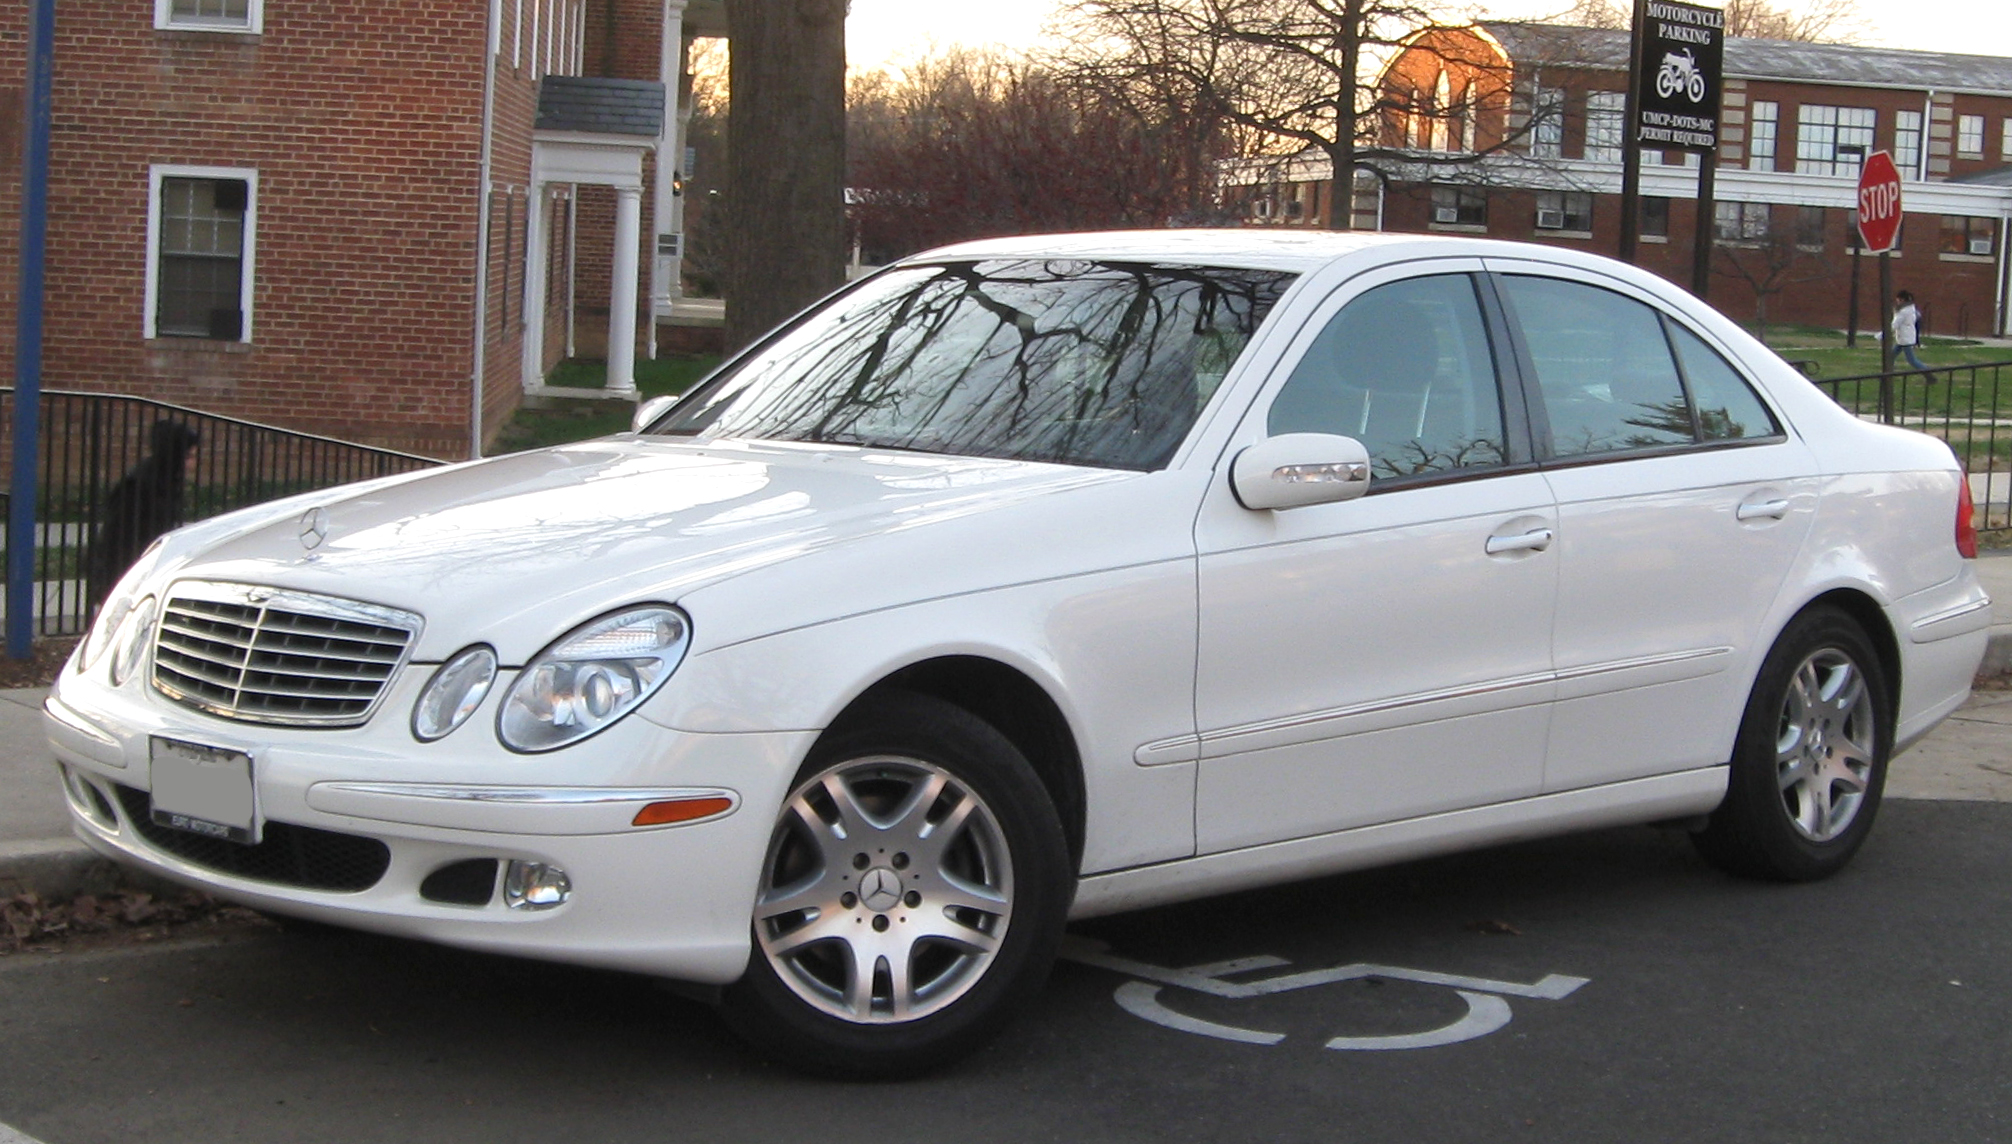 File Mercedes Benz E320 1 12 17 2009 Jpg Wikimedia